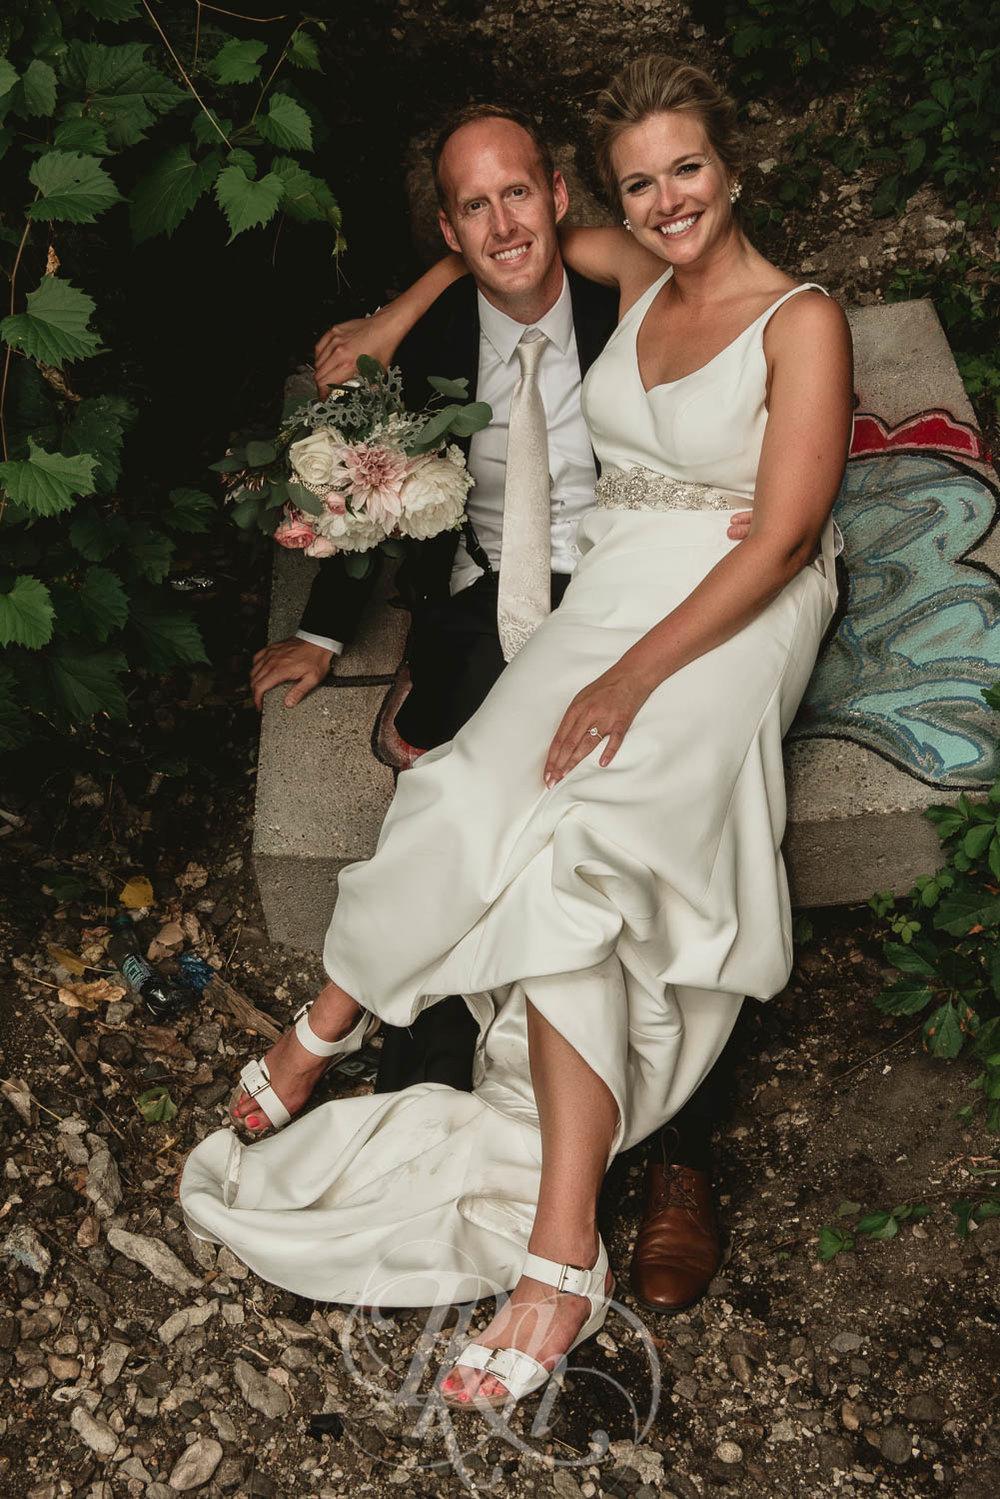 Becky & Jeff - Minneapolis Wedding Photography - Minneapolis Event Center - RKH Images - Blog  (27 of 40).jpg